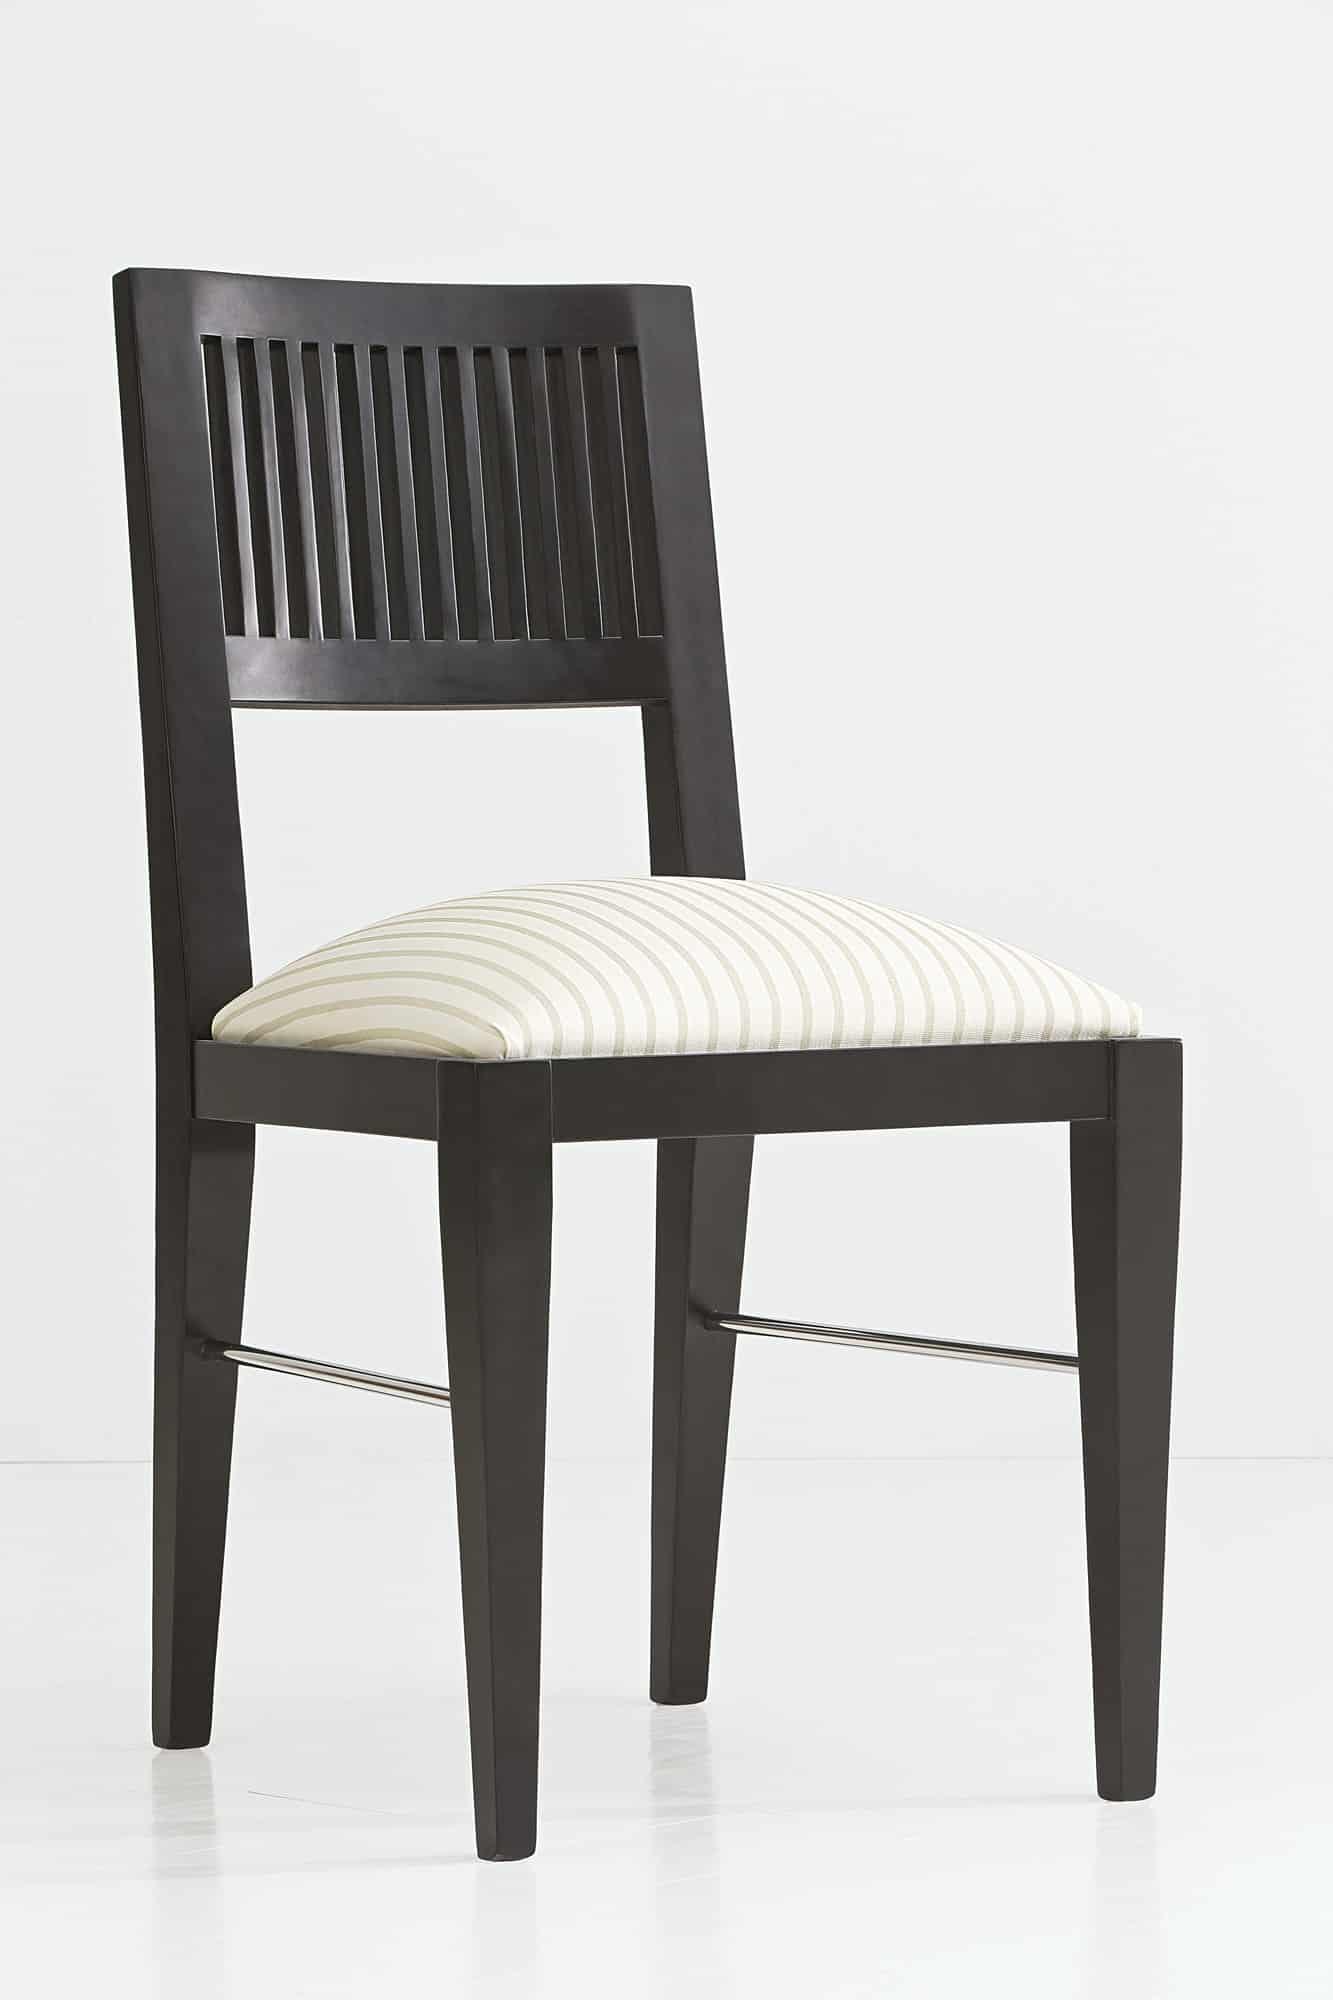 Stuhl Sitzhhe 60 Cm Cool Fr With Stuhl Sitzhhe 60 Cm Awesome Abmessungen Tisch Hhe Cm Breite